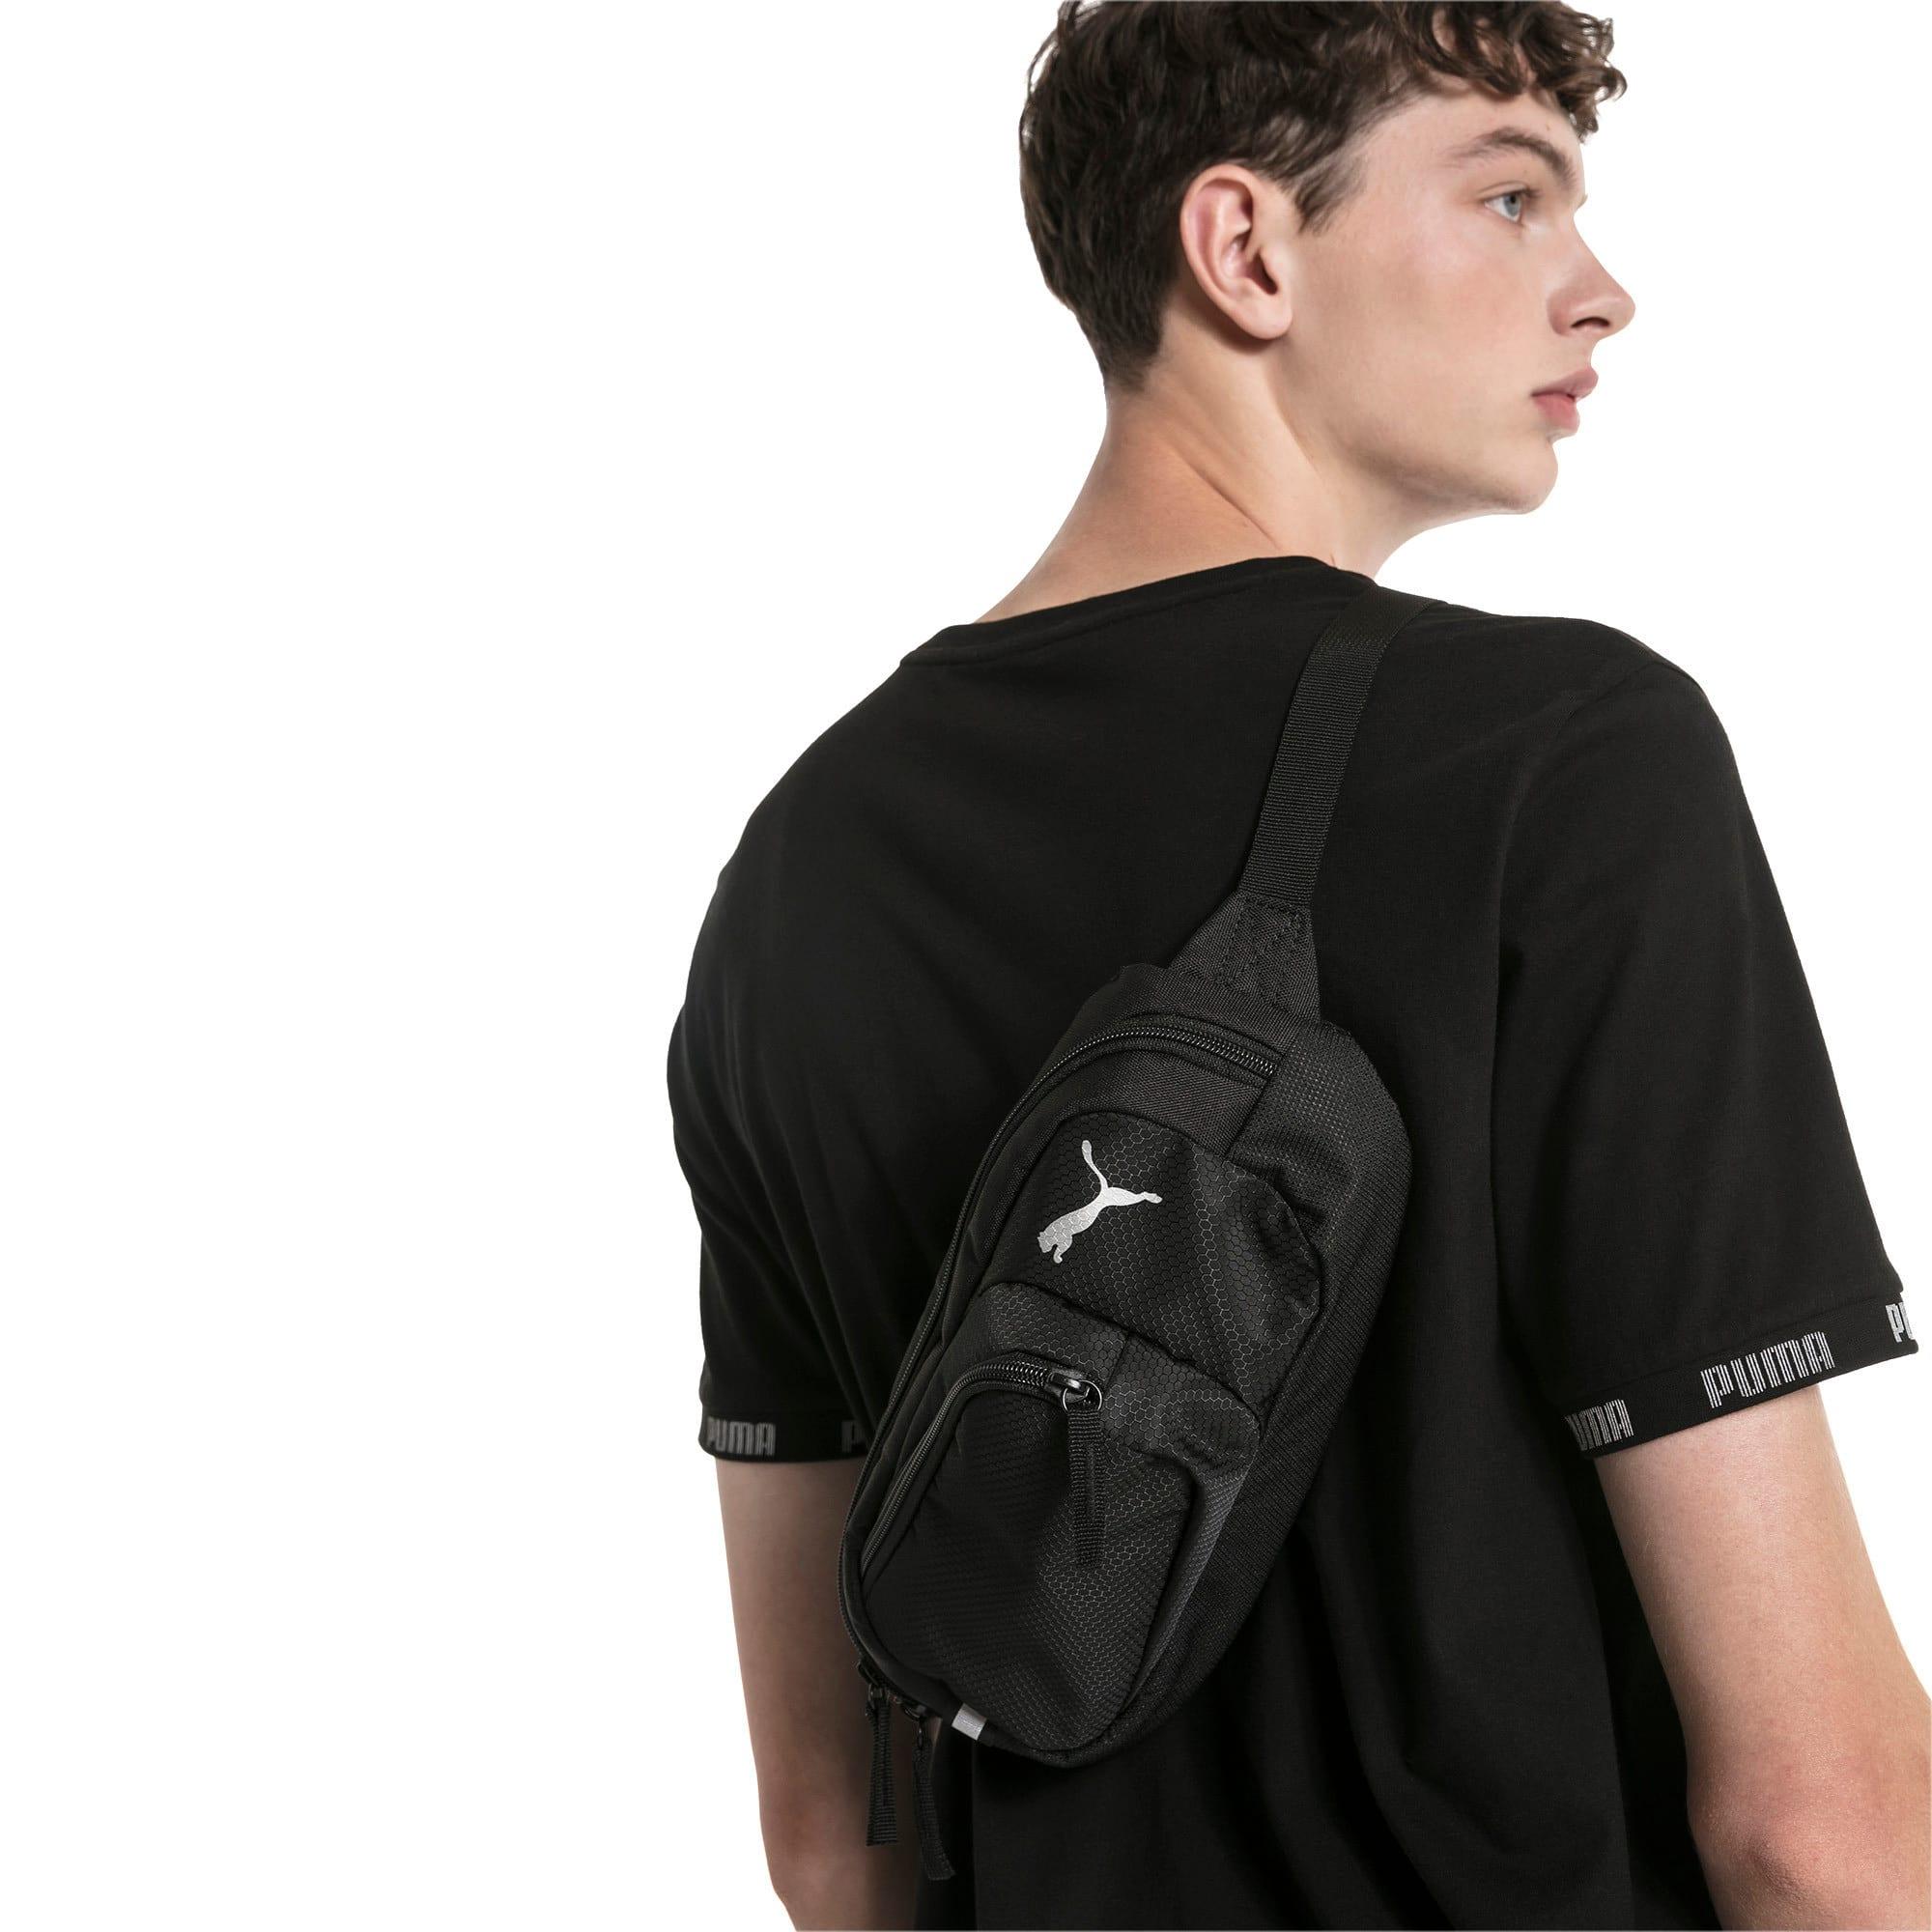 Thumbnail 2 of PUMA X Multi Waist Bag, Puma Black, medium